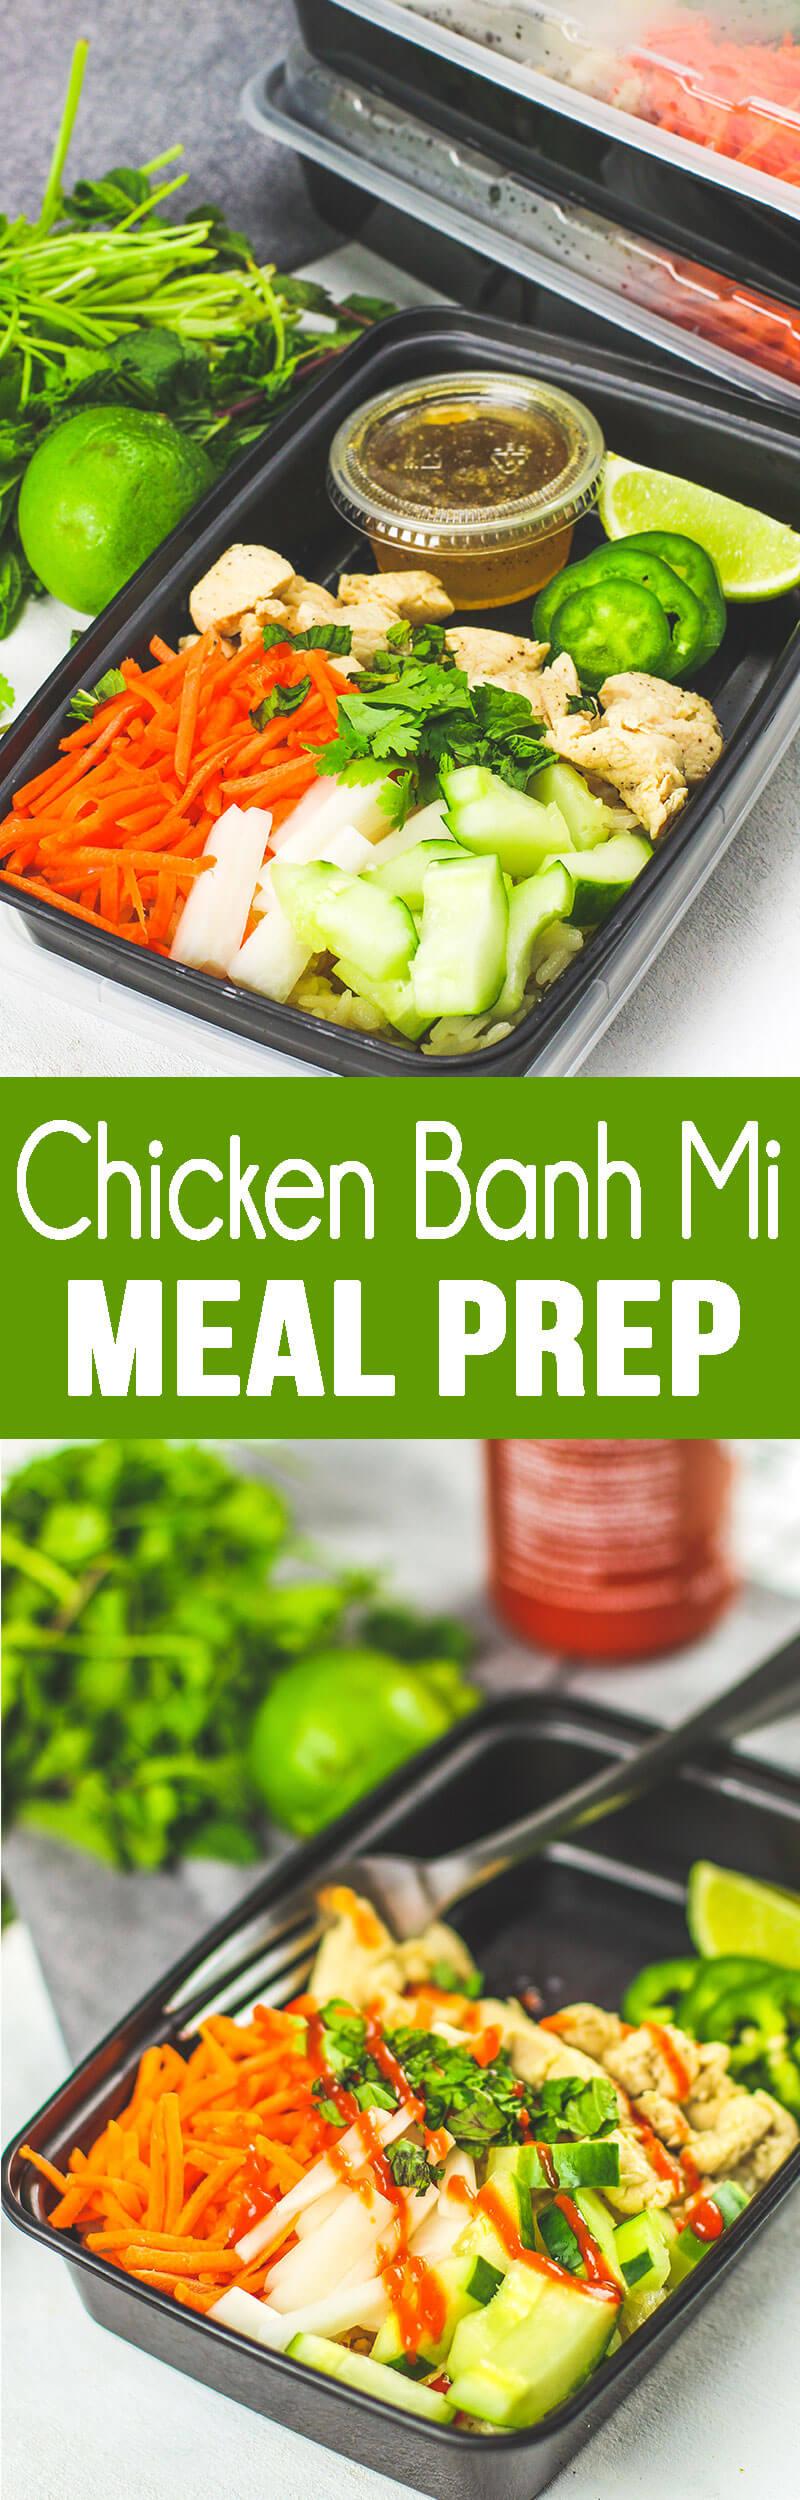 Chicken Banh Mi Meal Prep